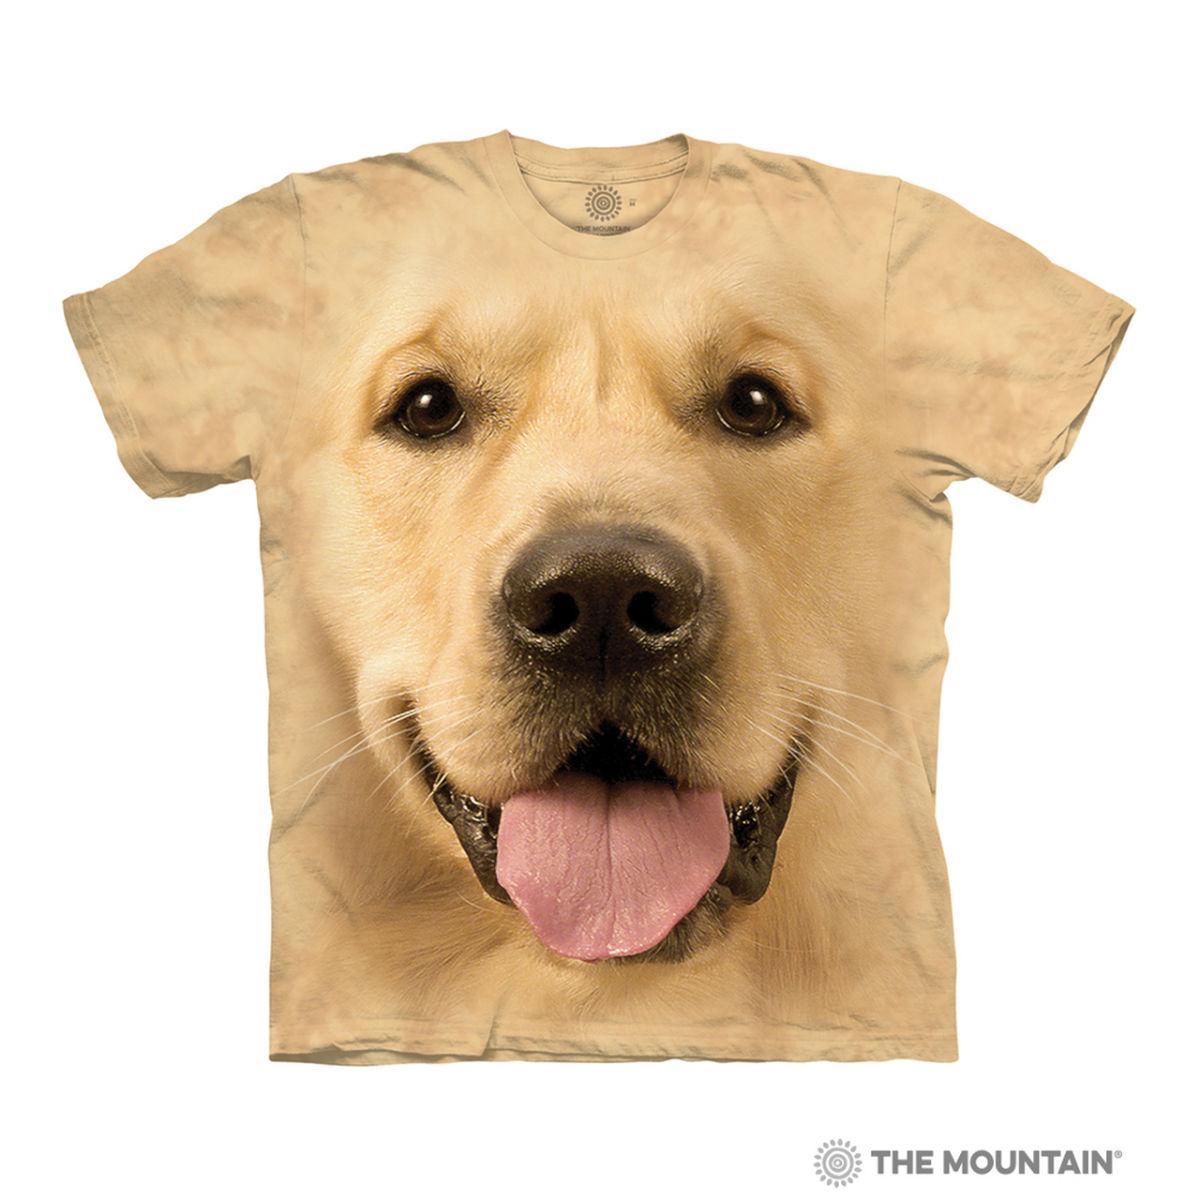 Big Face Golden Human T-Shirt by The Mountain